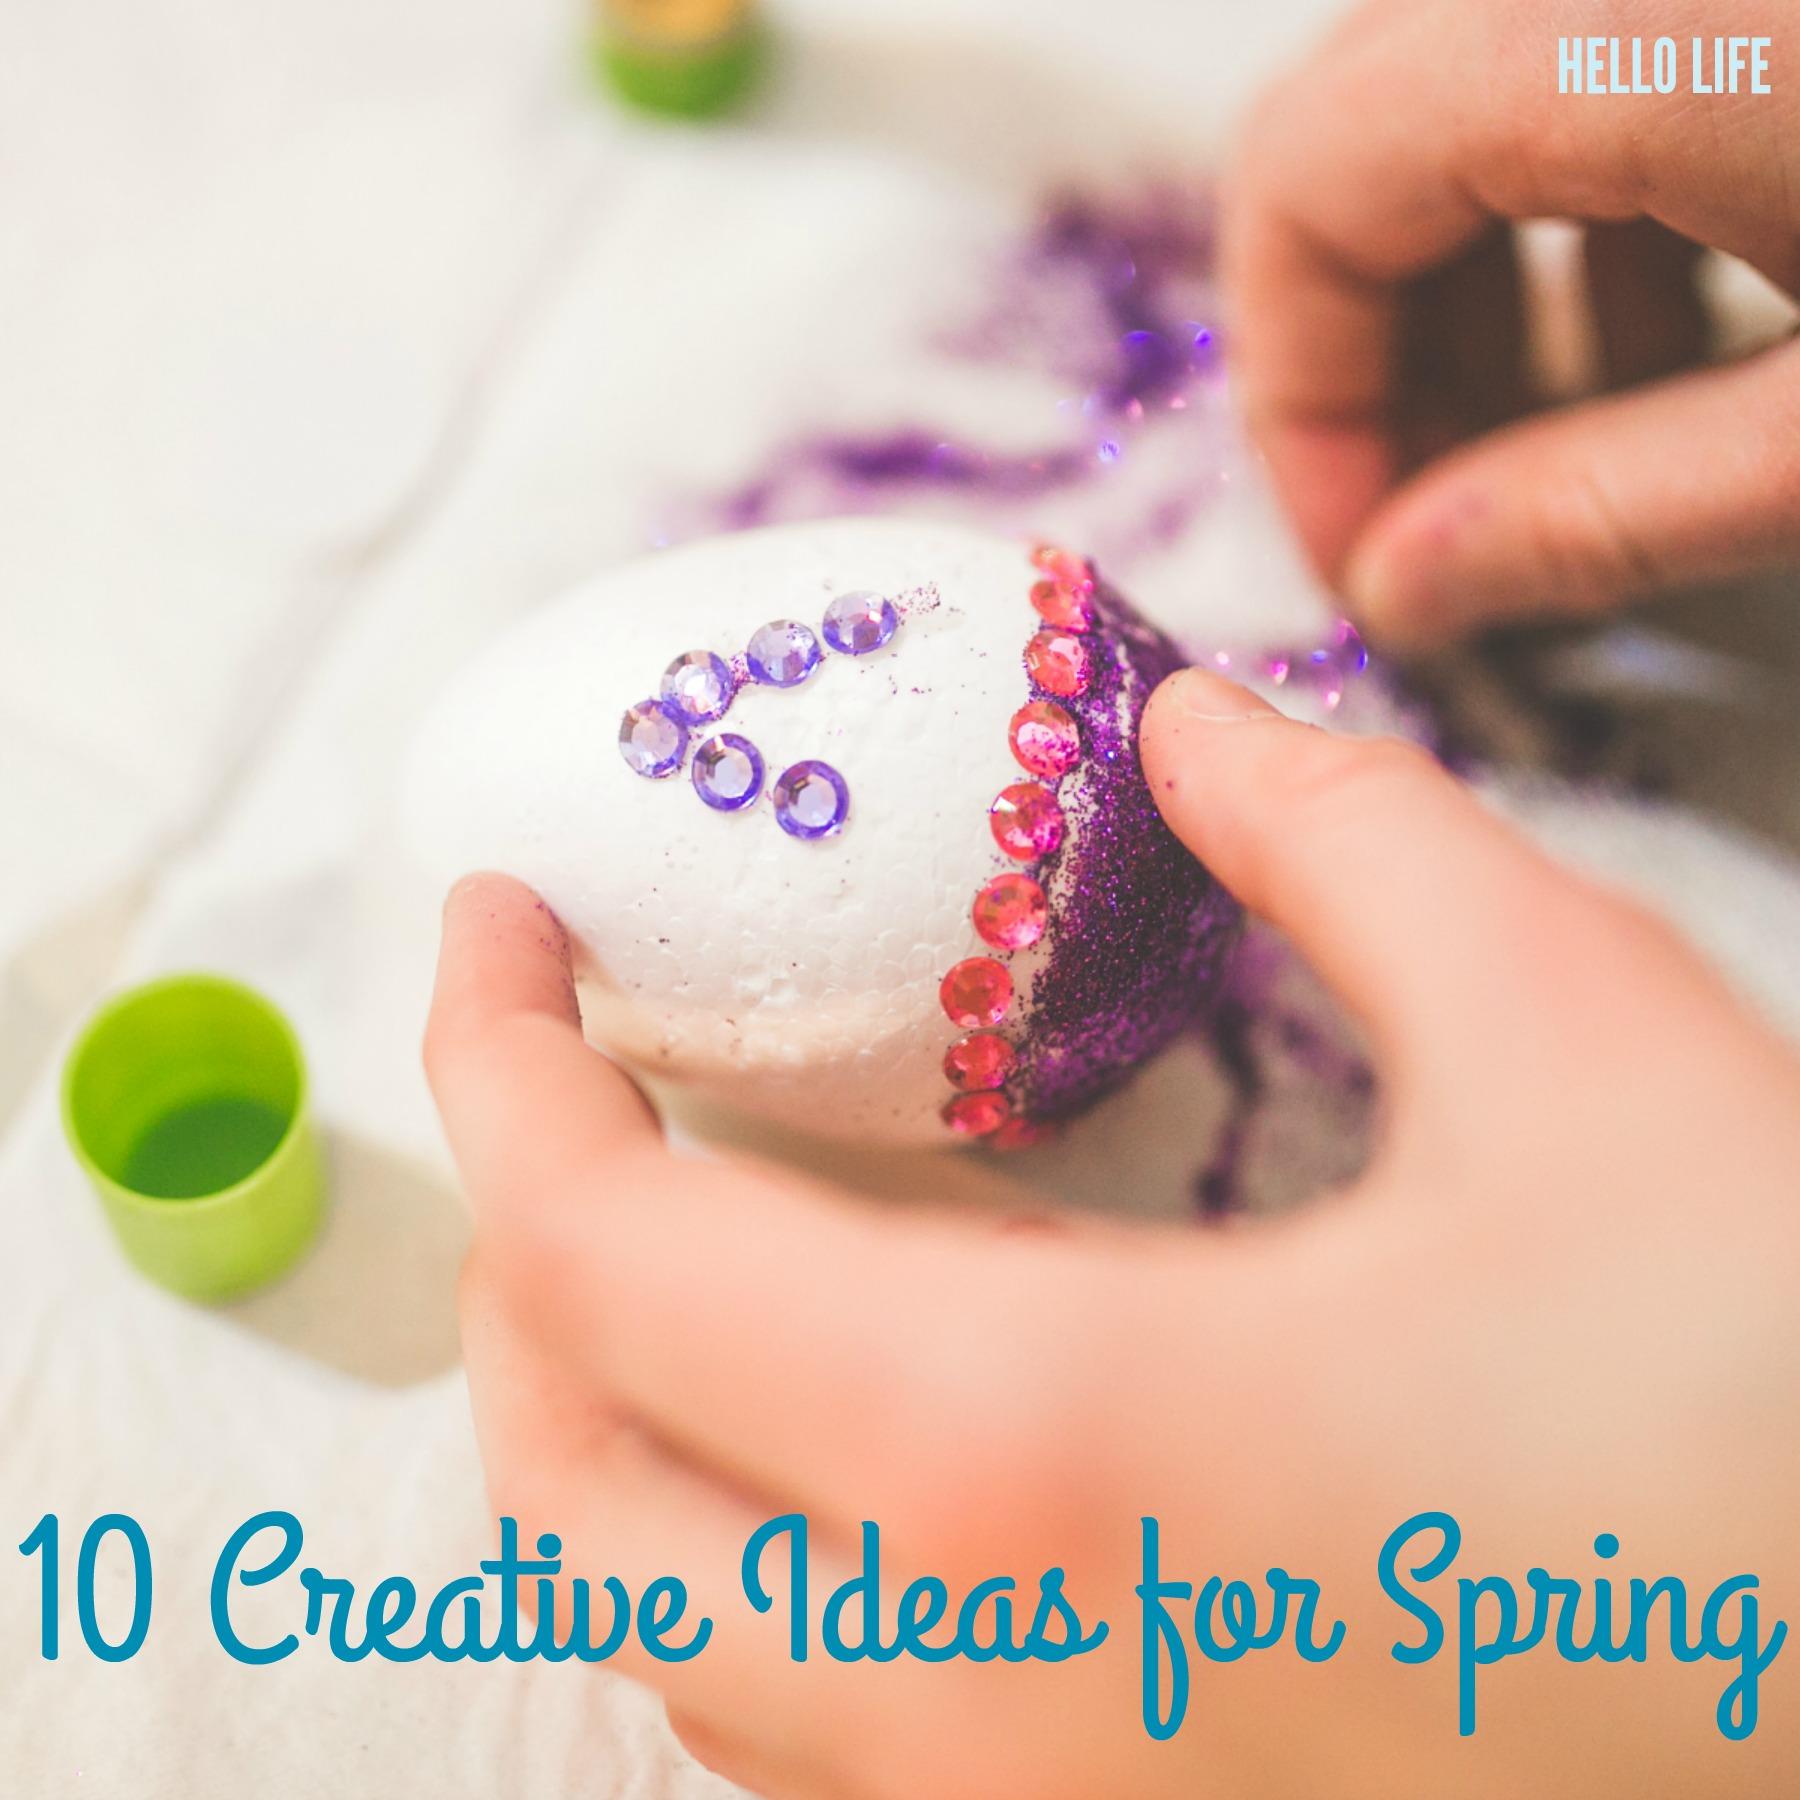 10 Creative Ideas For Spring | Hello Life hellolifeonline.com